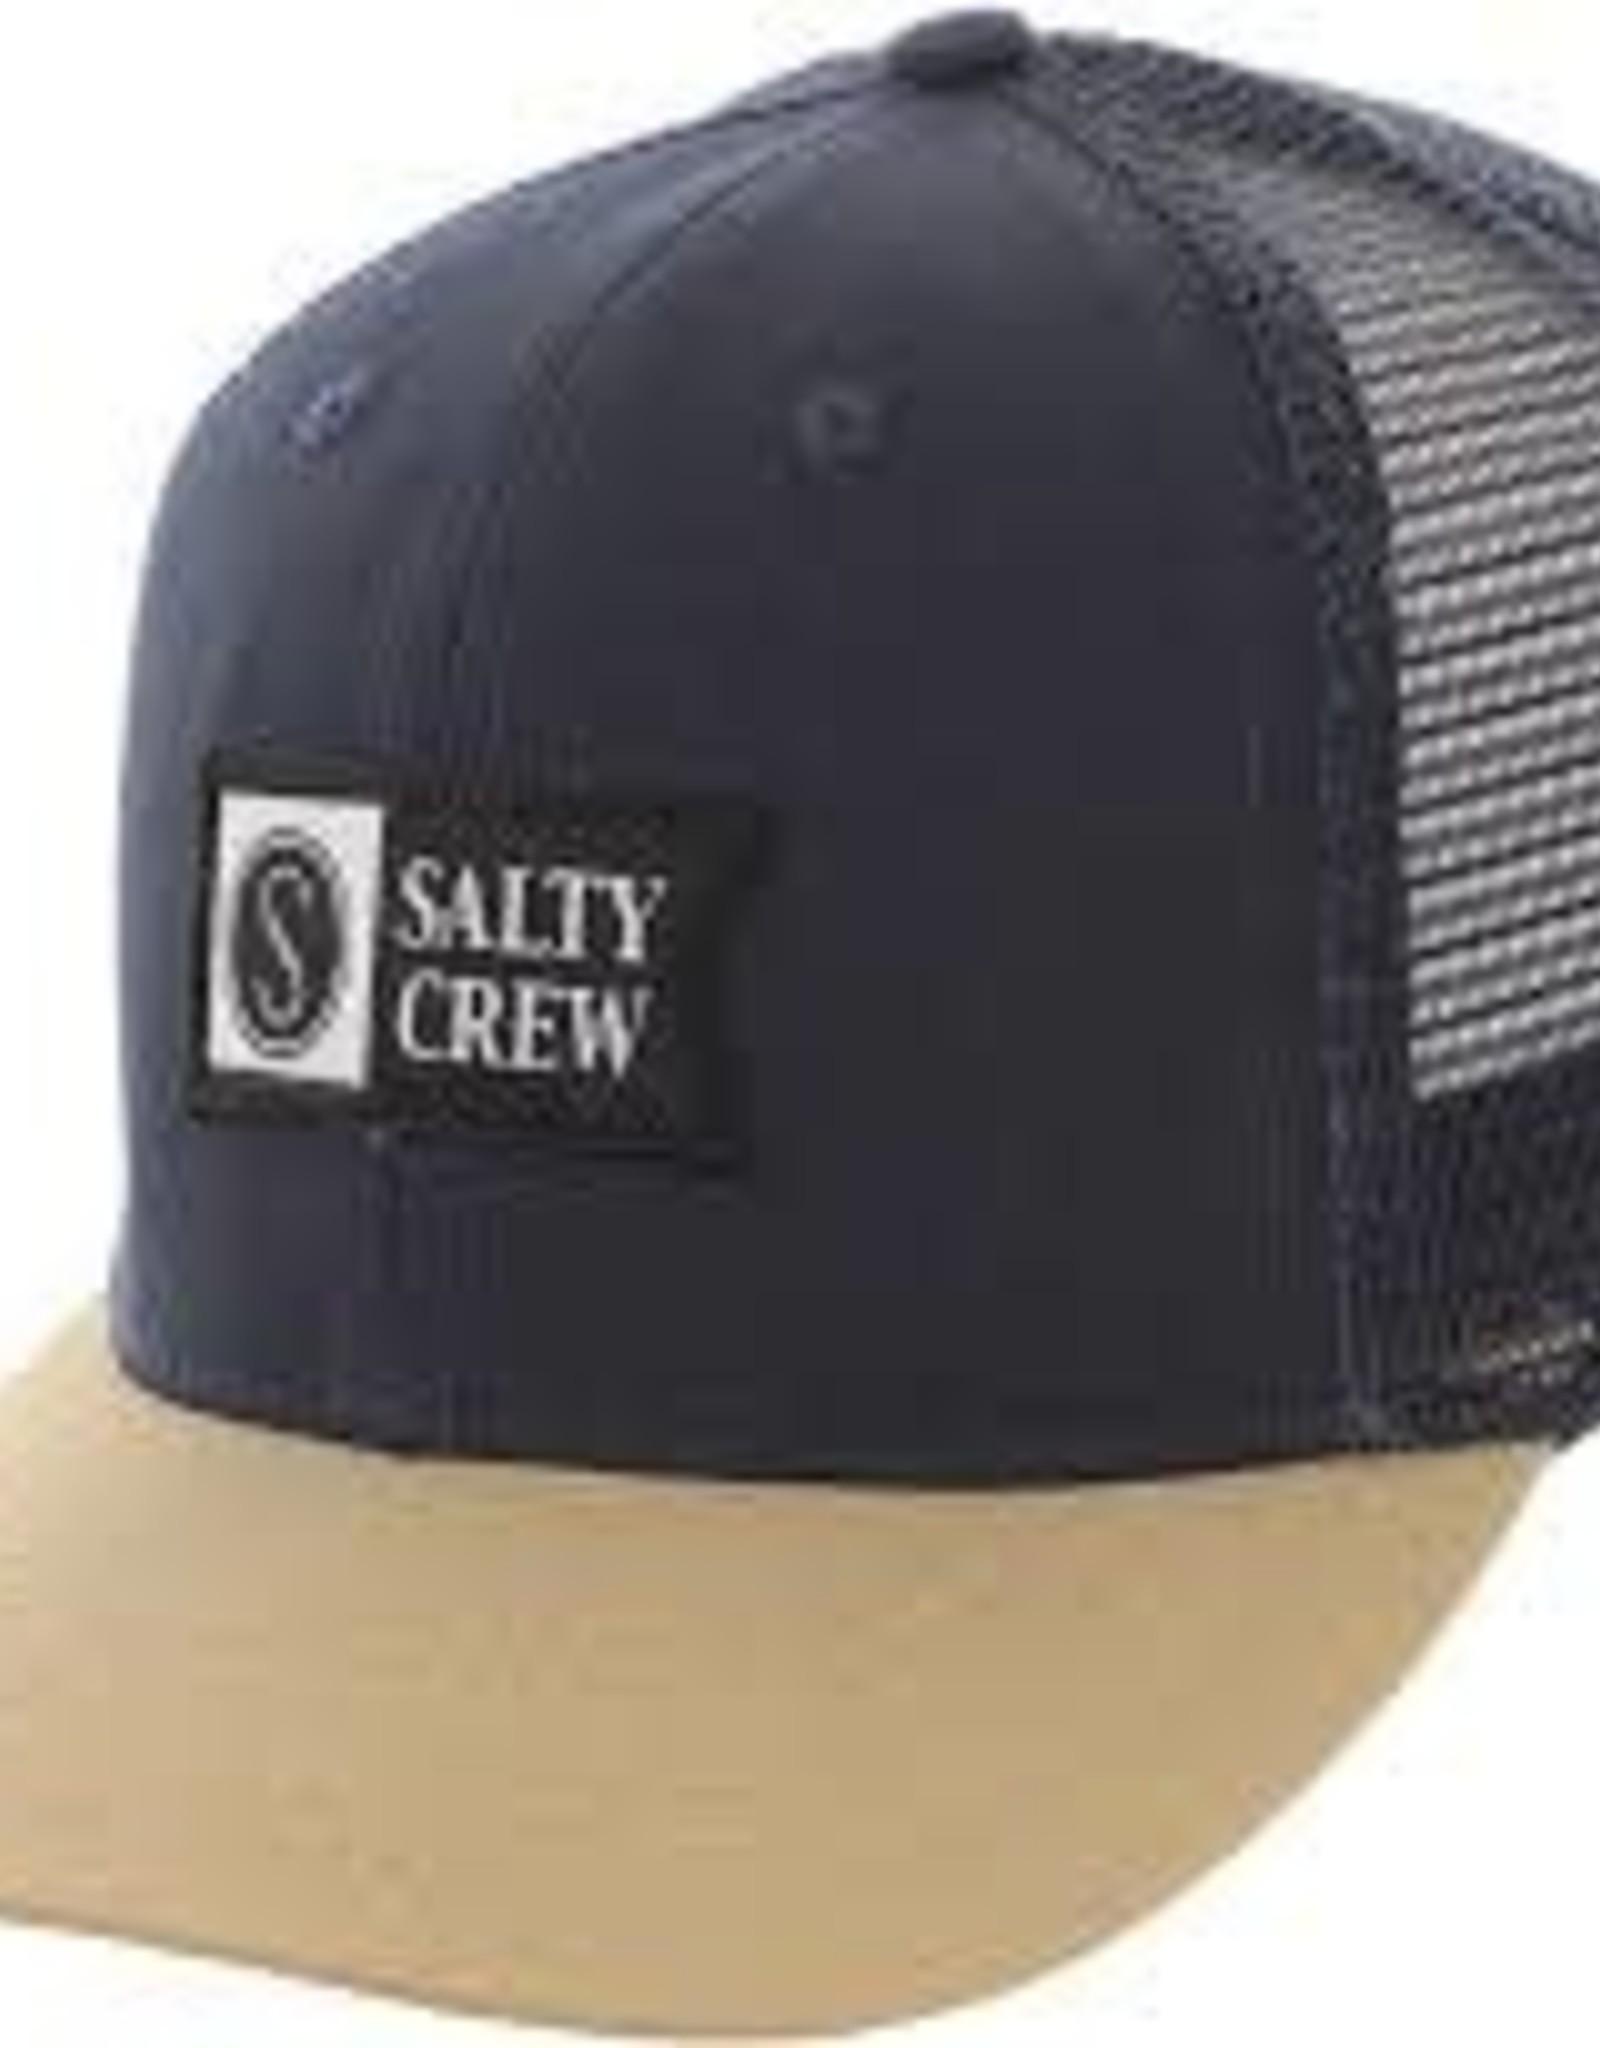 Salty Crew Pinnacle Retro Trucker Hat  Navy/Tan